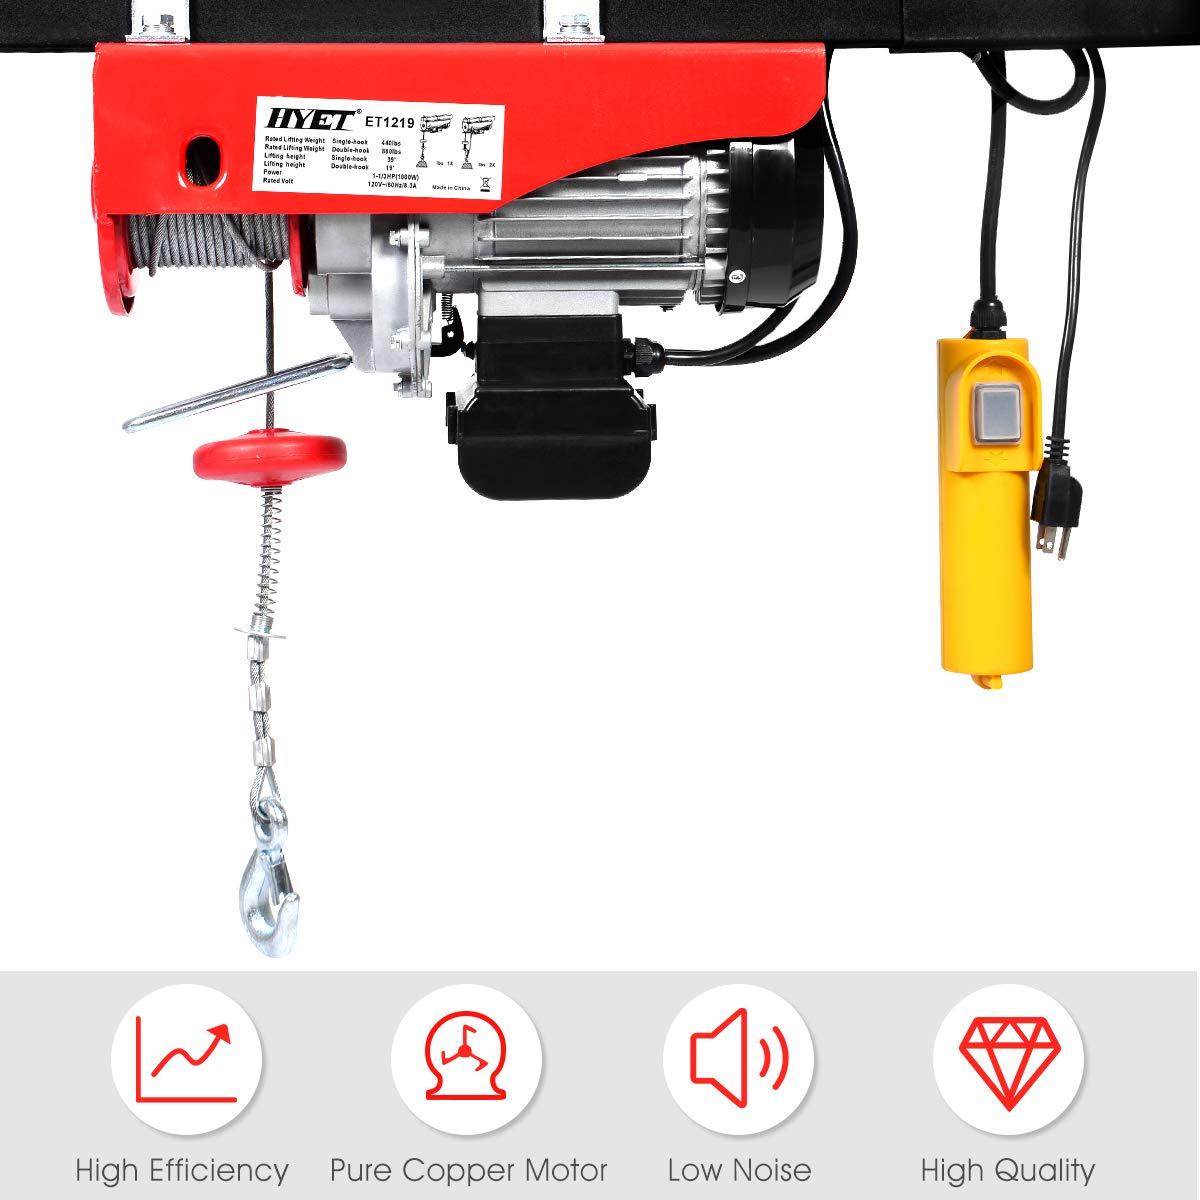 Amazon.com: Goplus Lift Electric Hoist Garage Auto Shop Electric Wire Hoist  Overhead Lift w/Remote Control (880LBS): Home Improvement